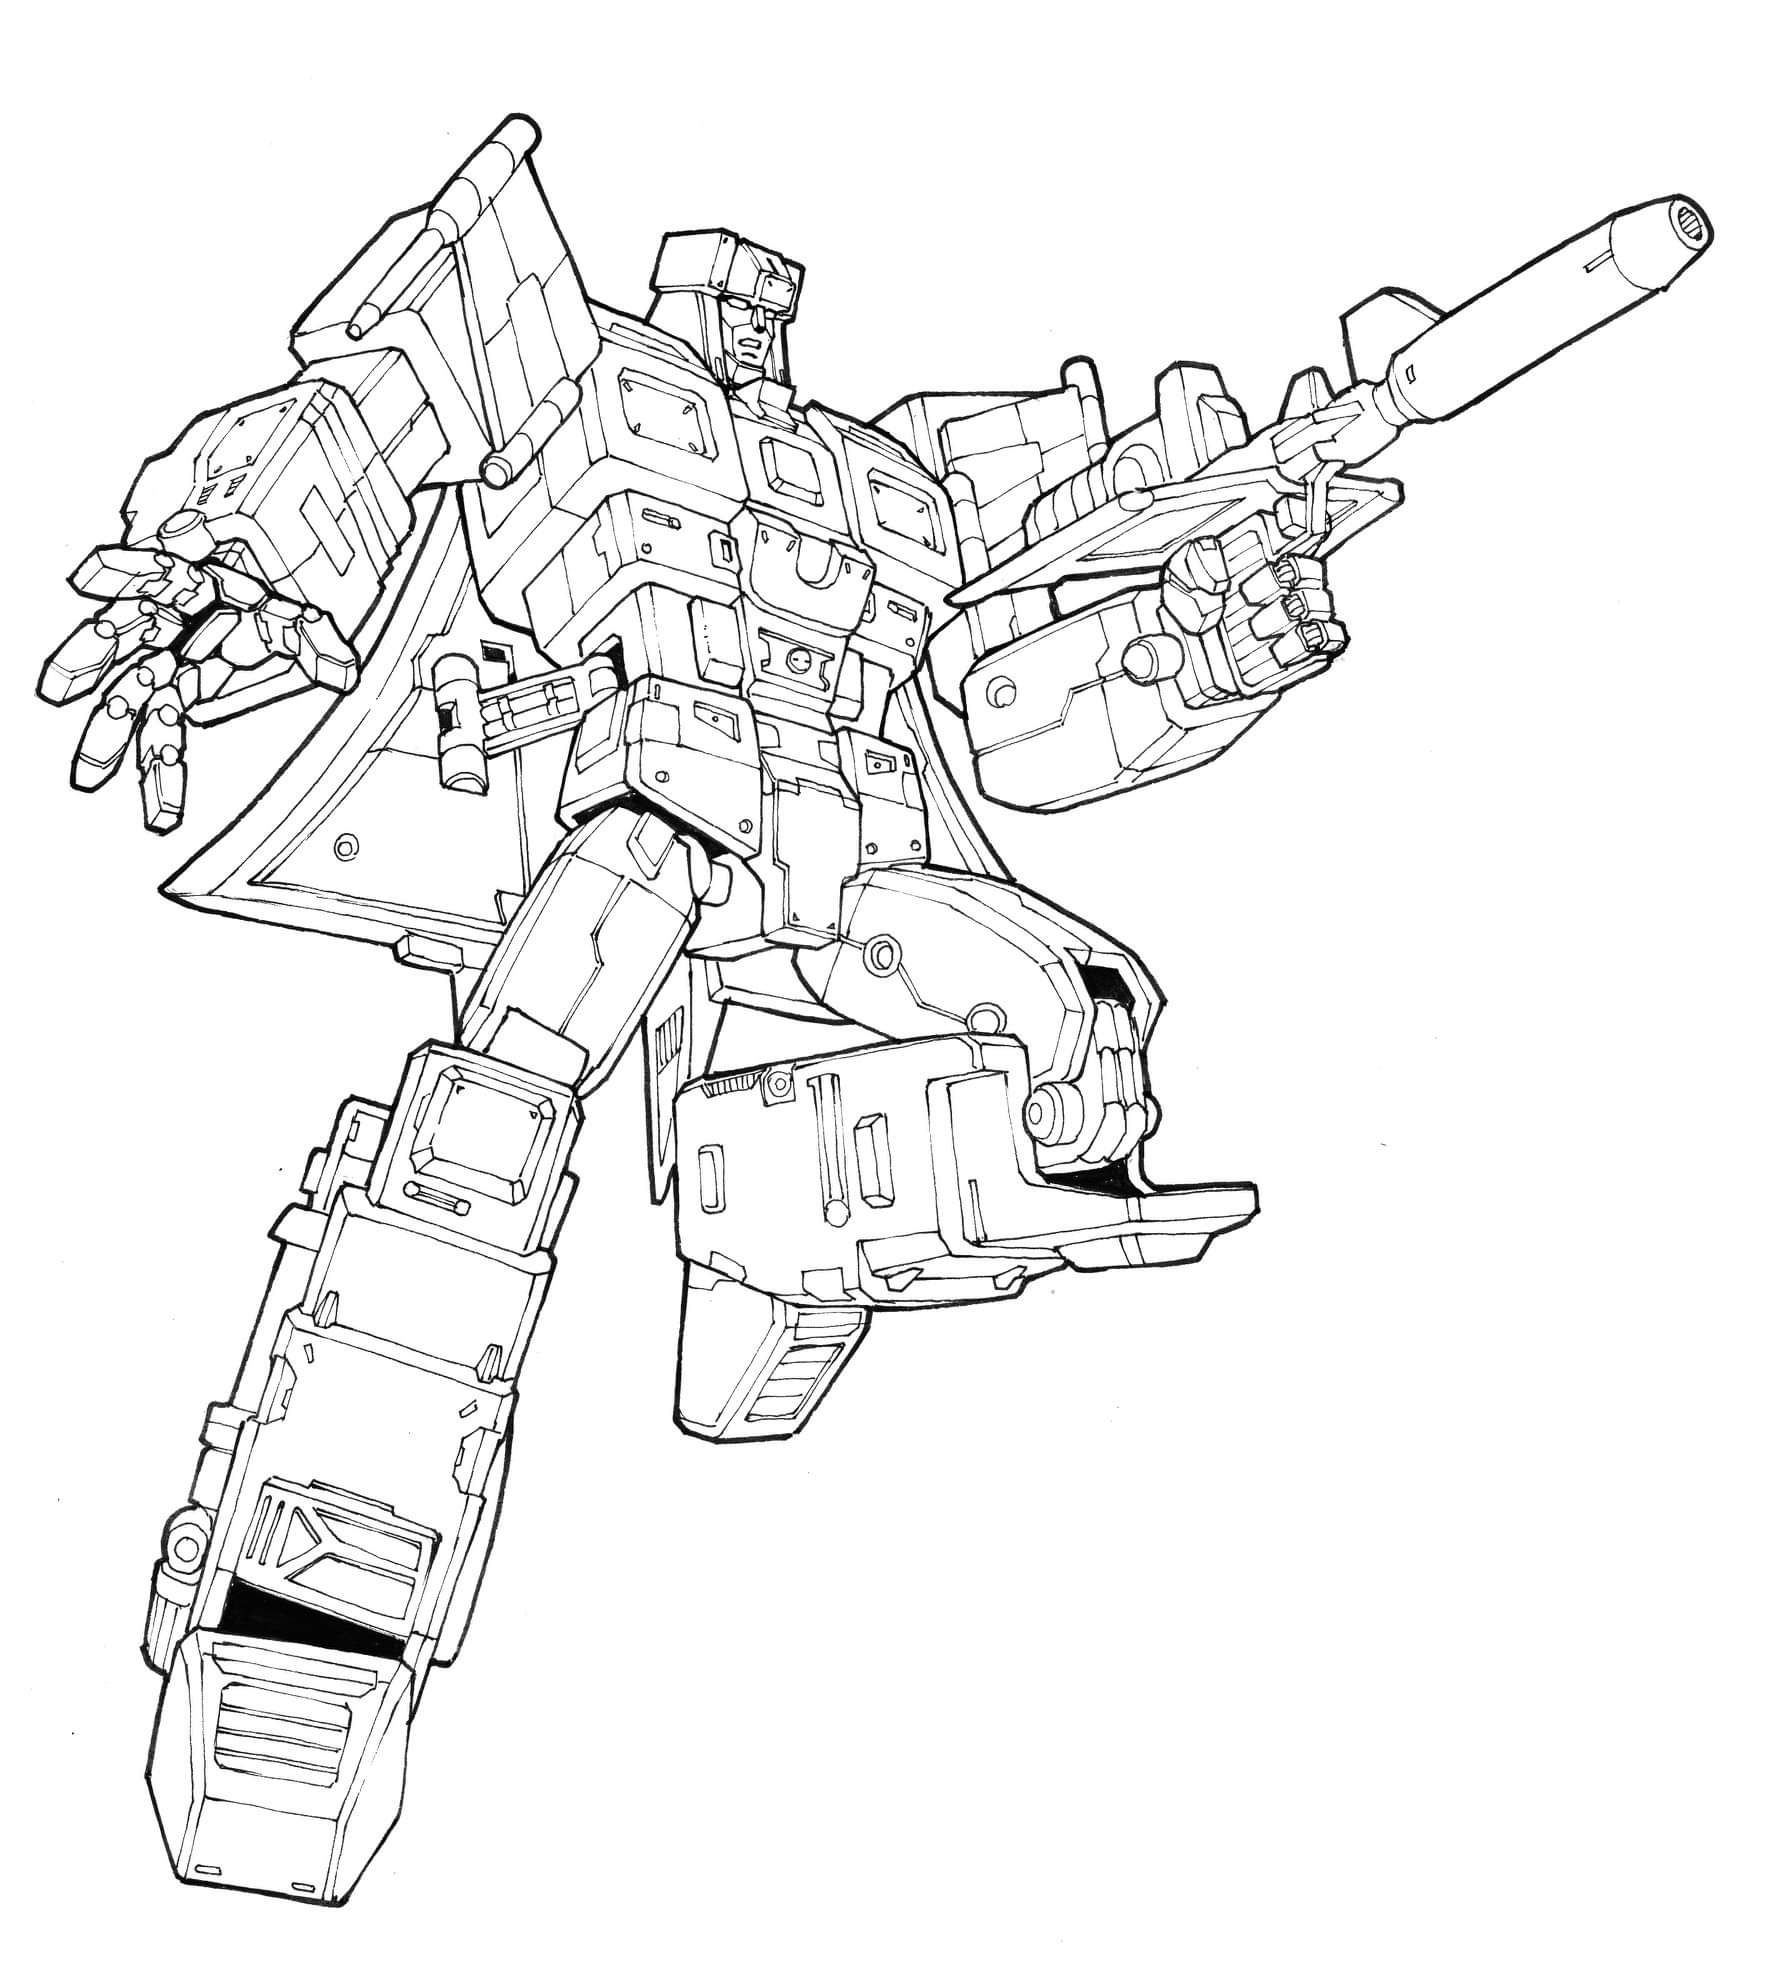 [Fanstoys] Produit Tiers - Jouet FT-30 Ethereaon (FT-30A à FT-30E) - aka Superion - Page 2 6smweIq2_o